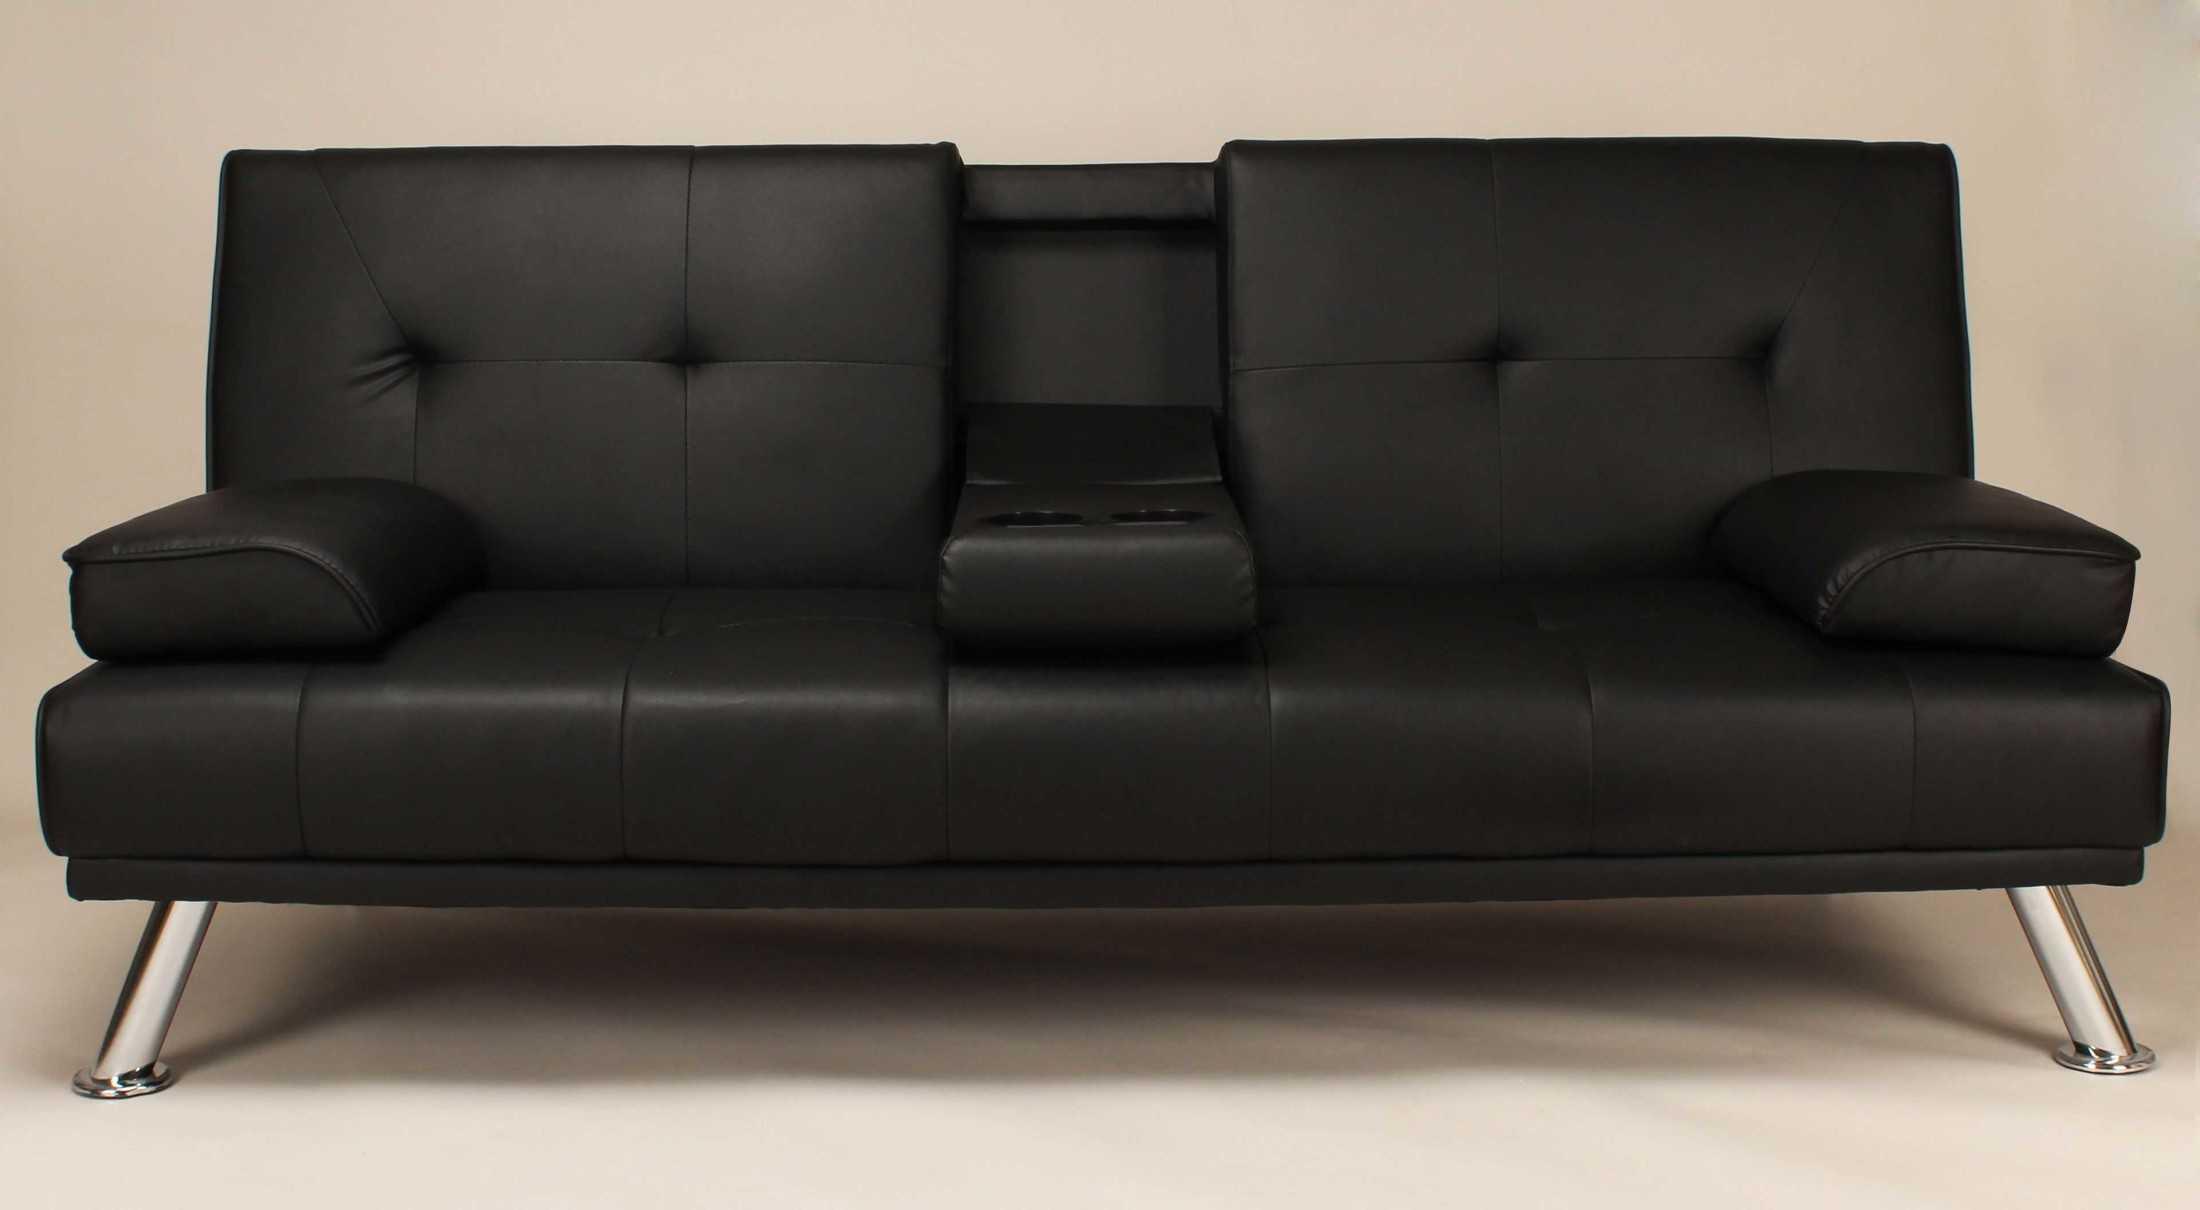 sofas dabi sofa bed black fabelio oleh pt tiga elora nusantara